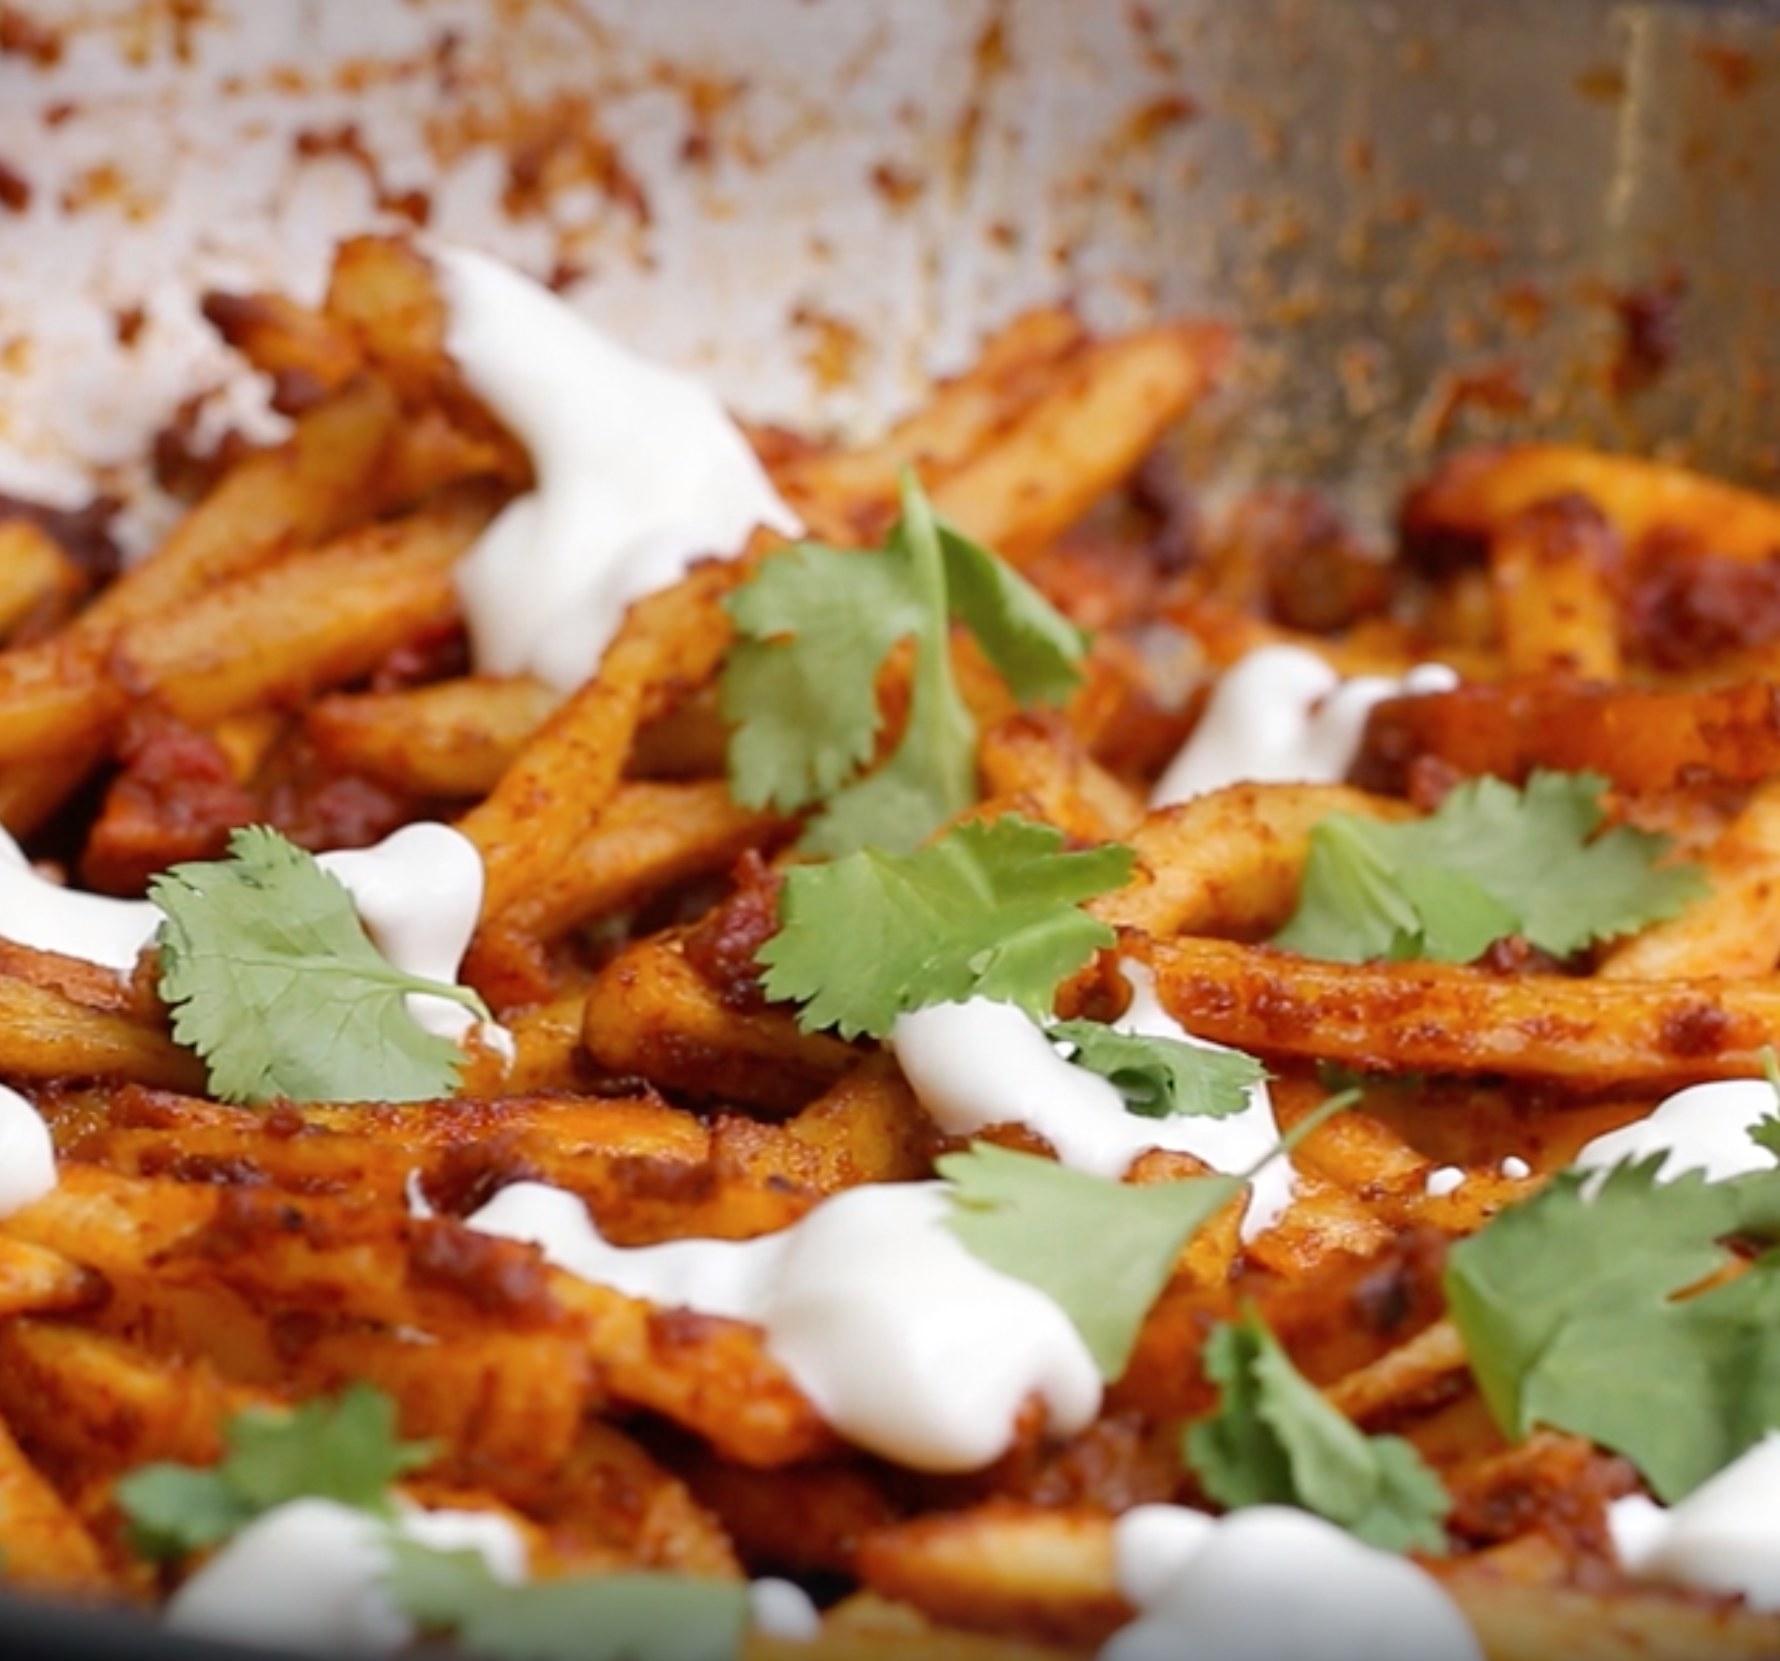 Masala french fries with yogurt and fresh coriander